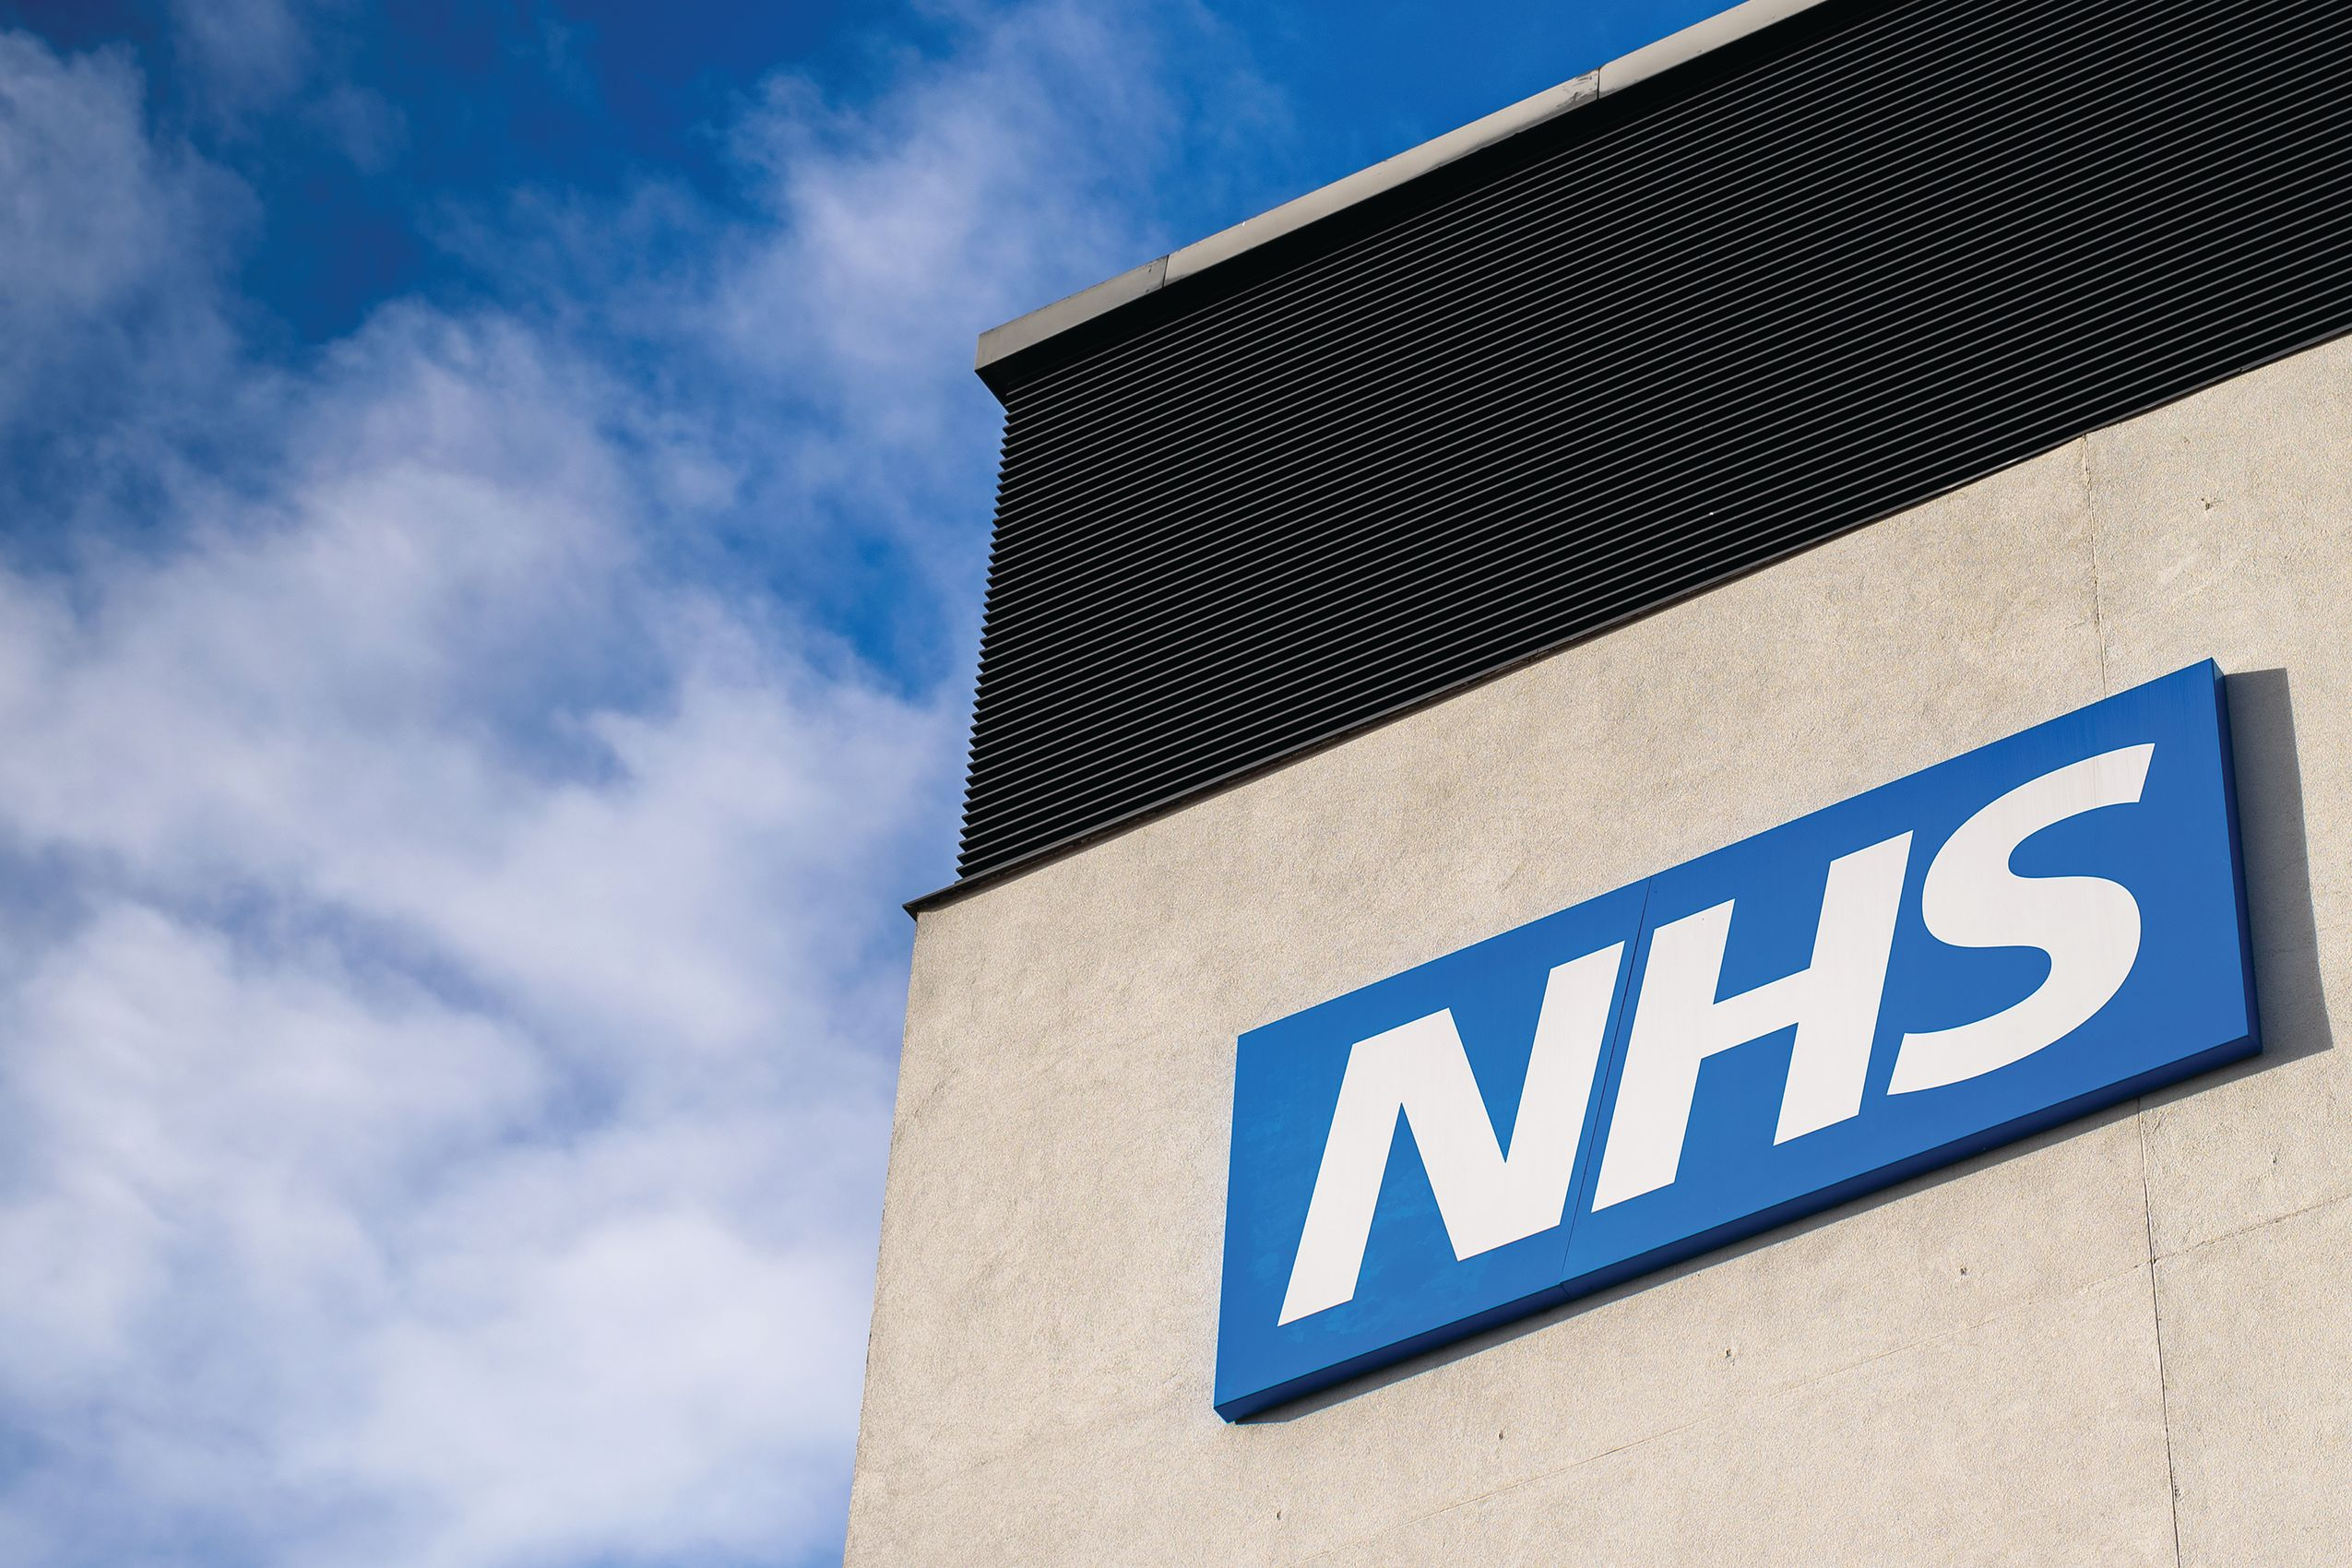 NHS Progressing Towards Net-Zero Commitment